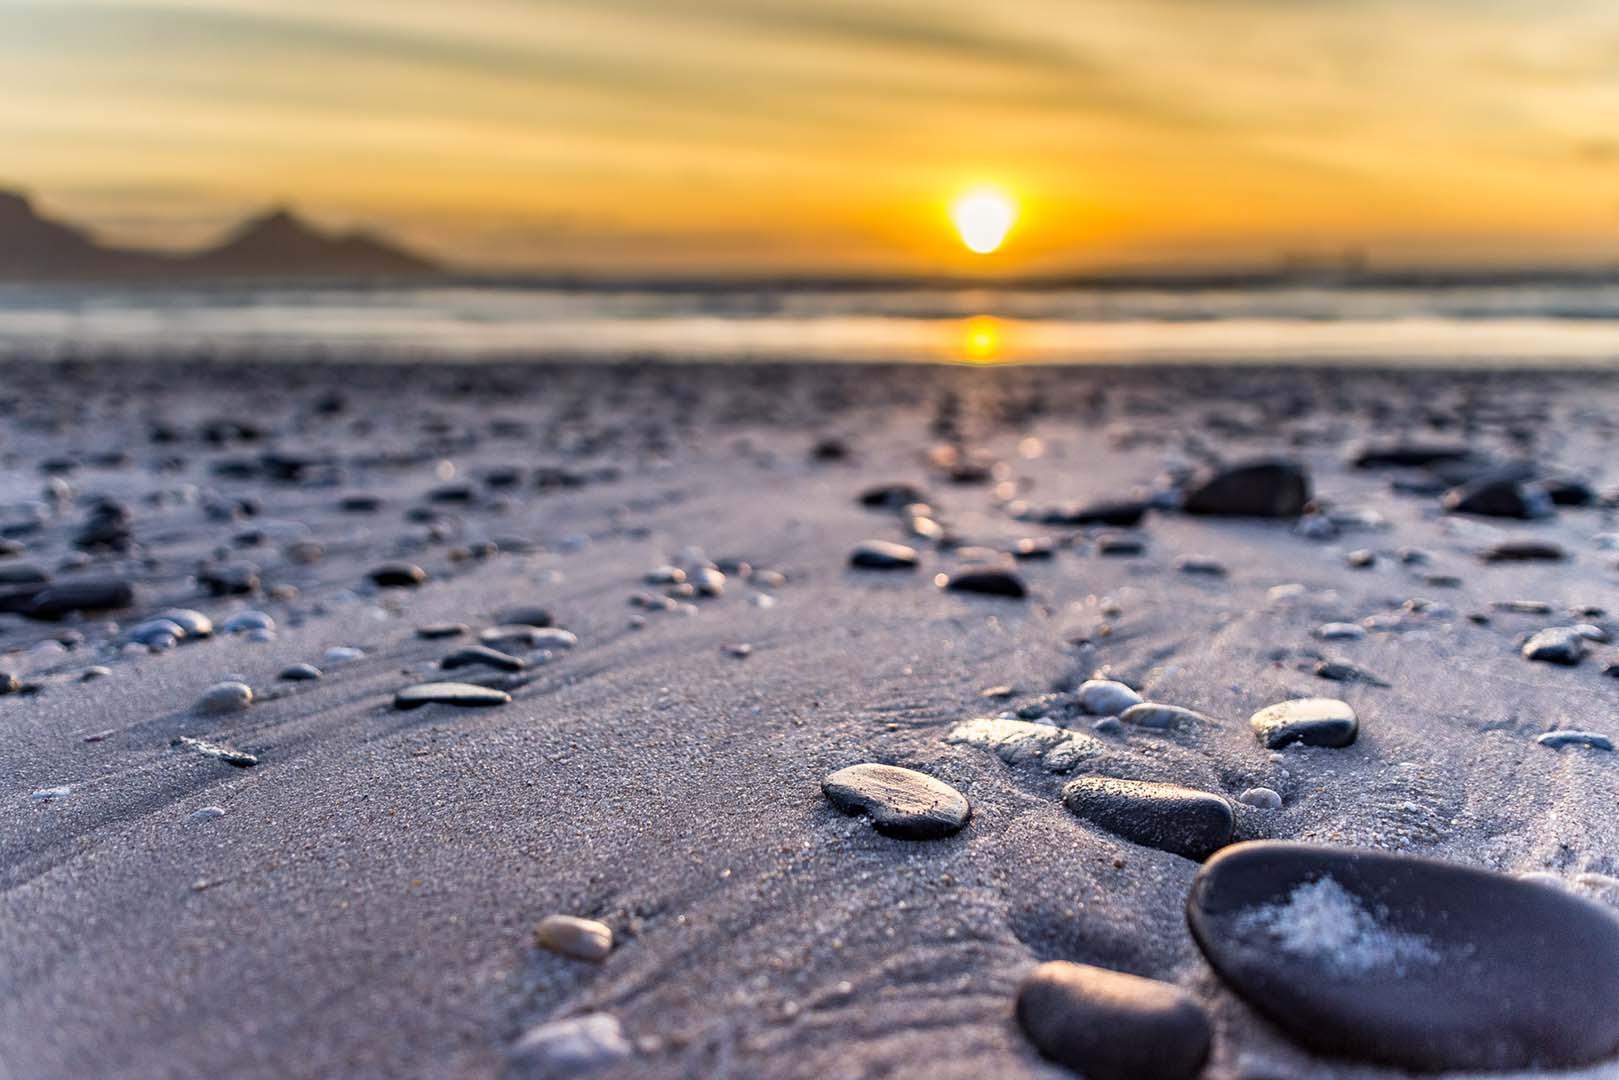 Image of the Sunset over Cape Town from Sunset Beach - Tinotenda-Chemvura